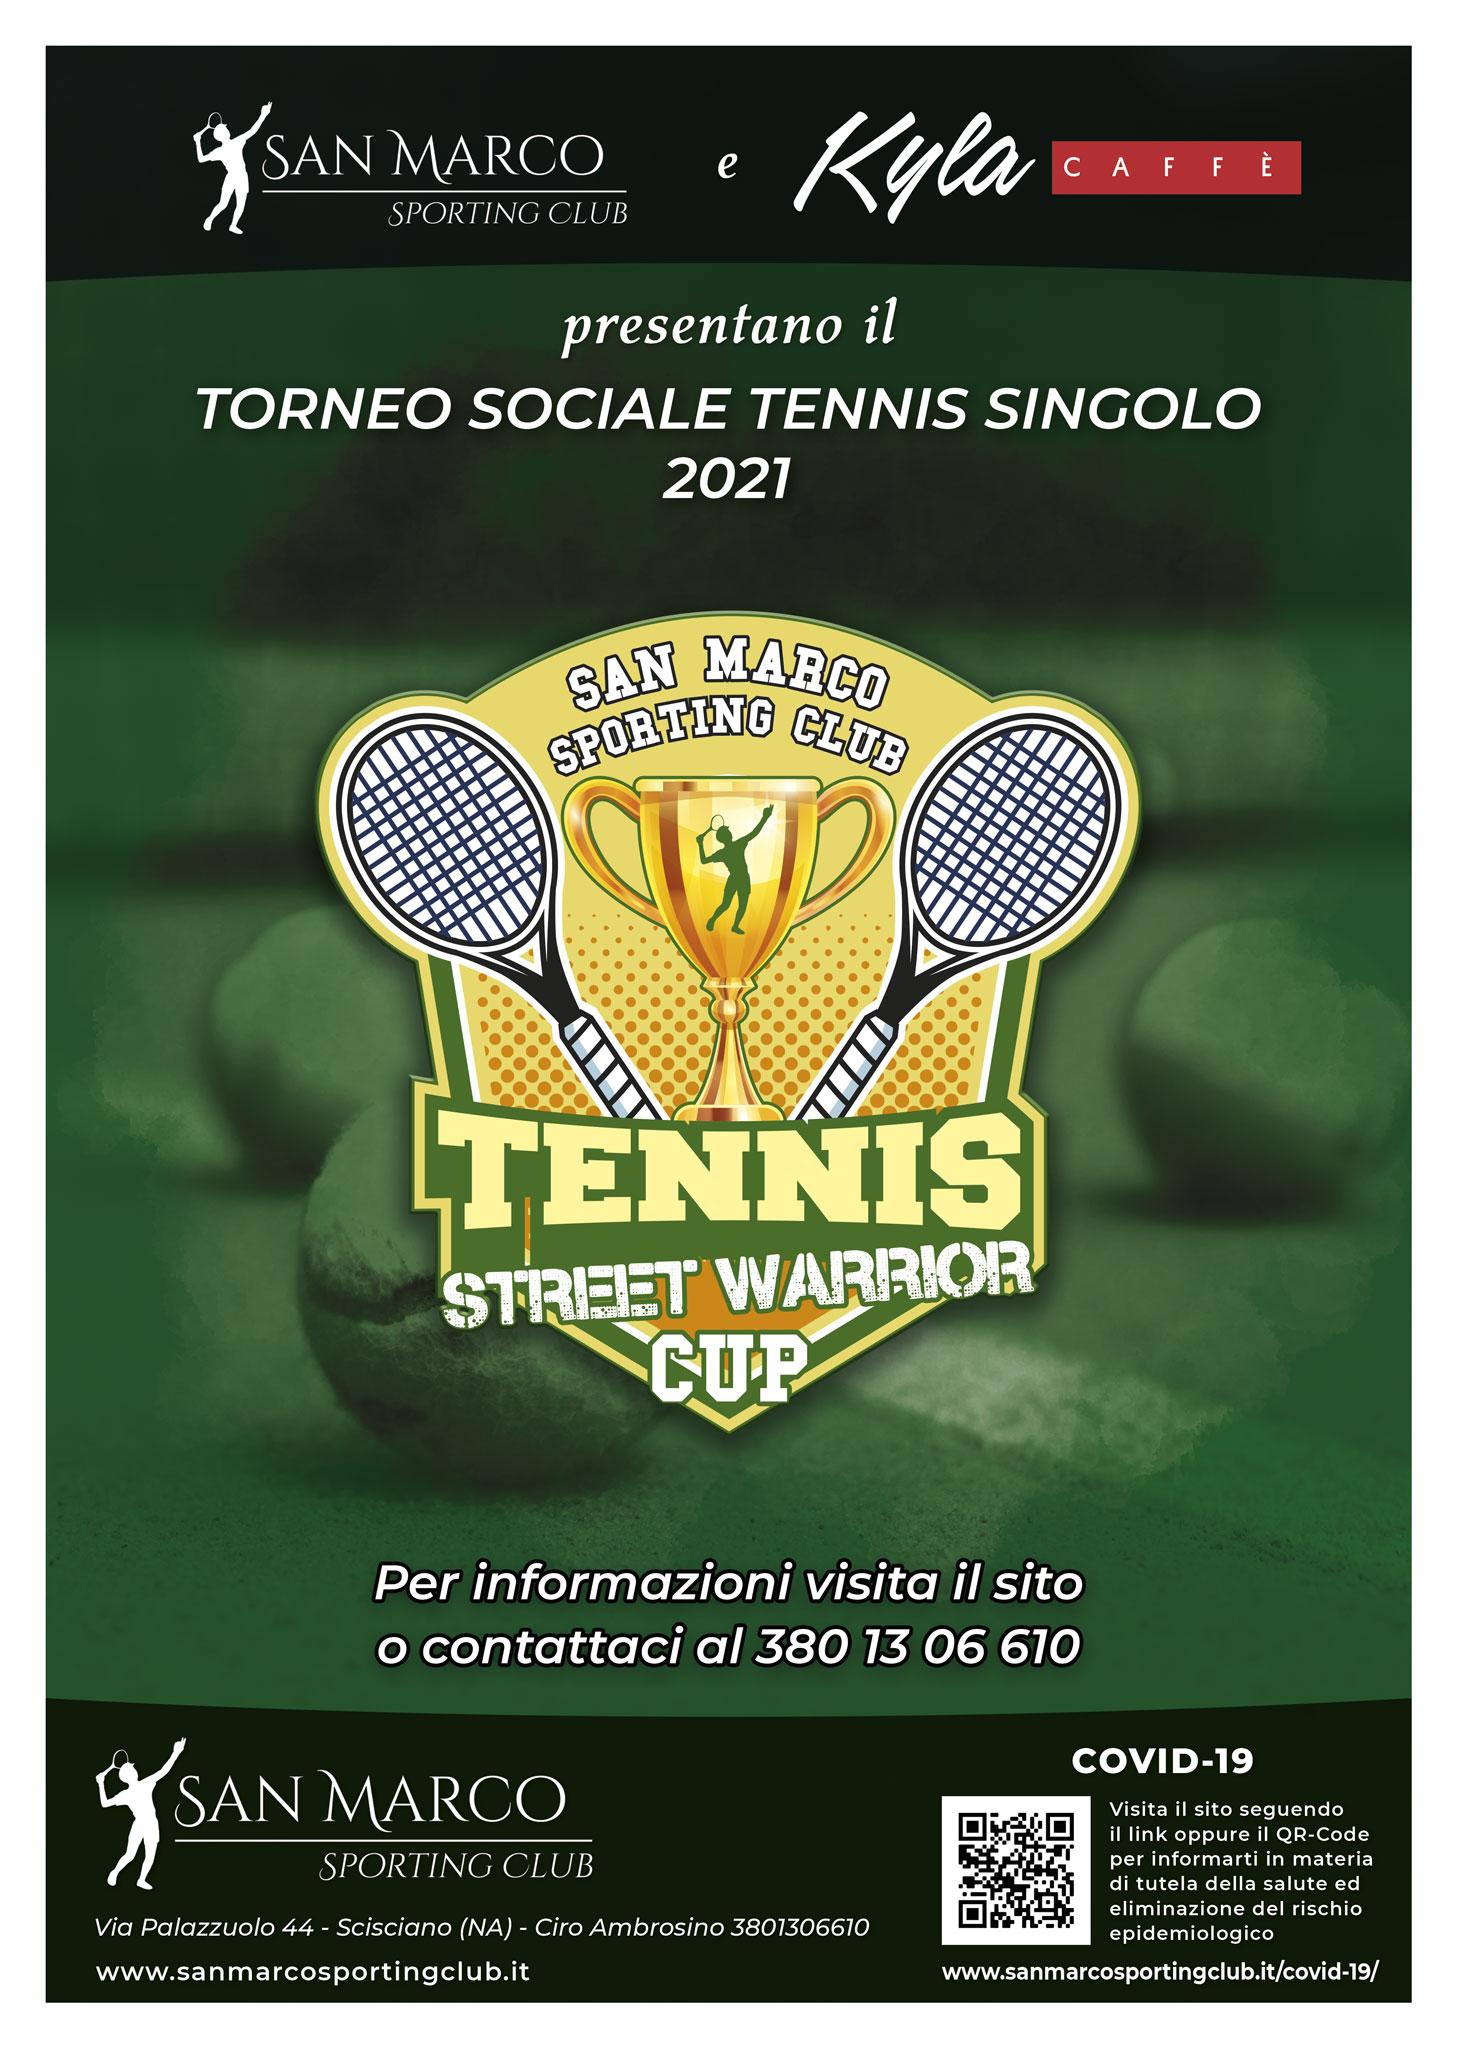 2020-09_TorneoSingolo_StreetWarriorCup_2021_locandina